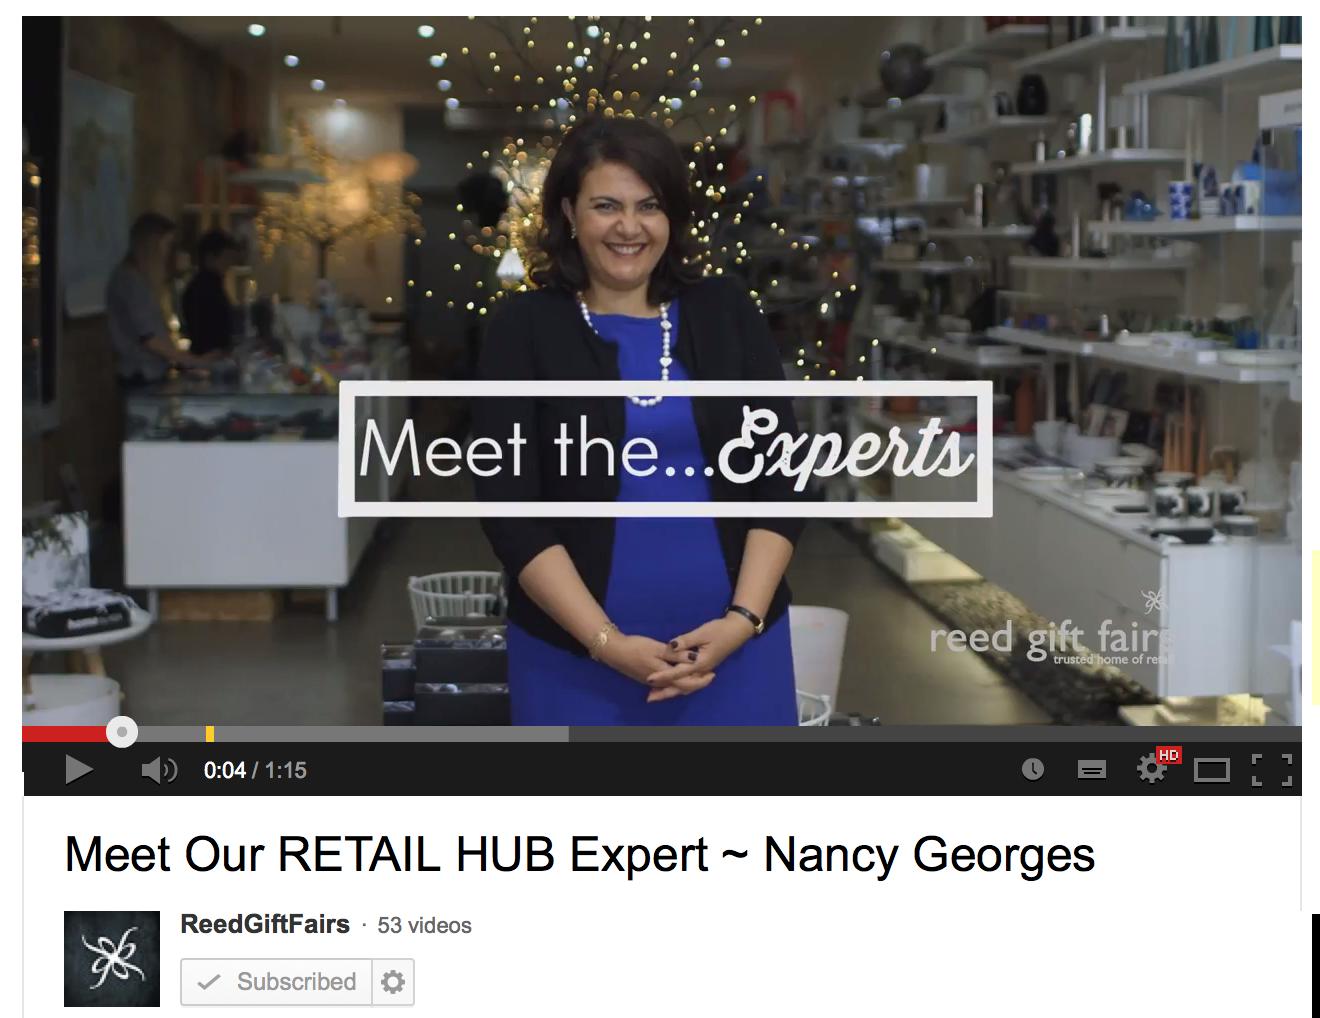 Nancy Georges at Reed Gift Fairs Retail Hub